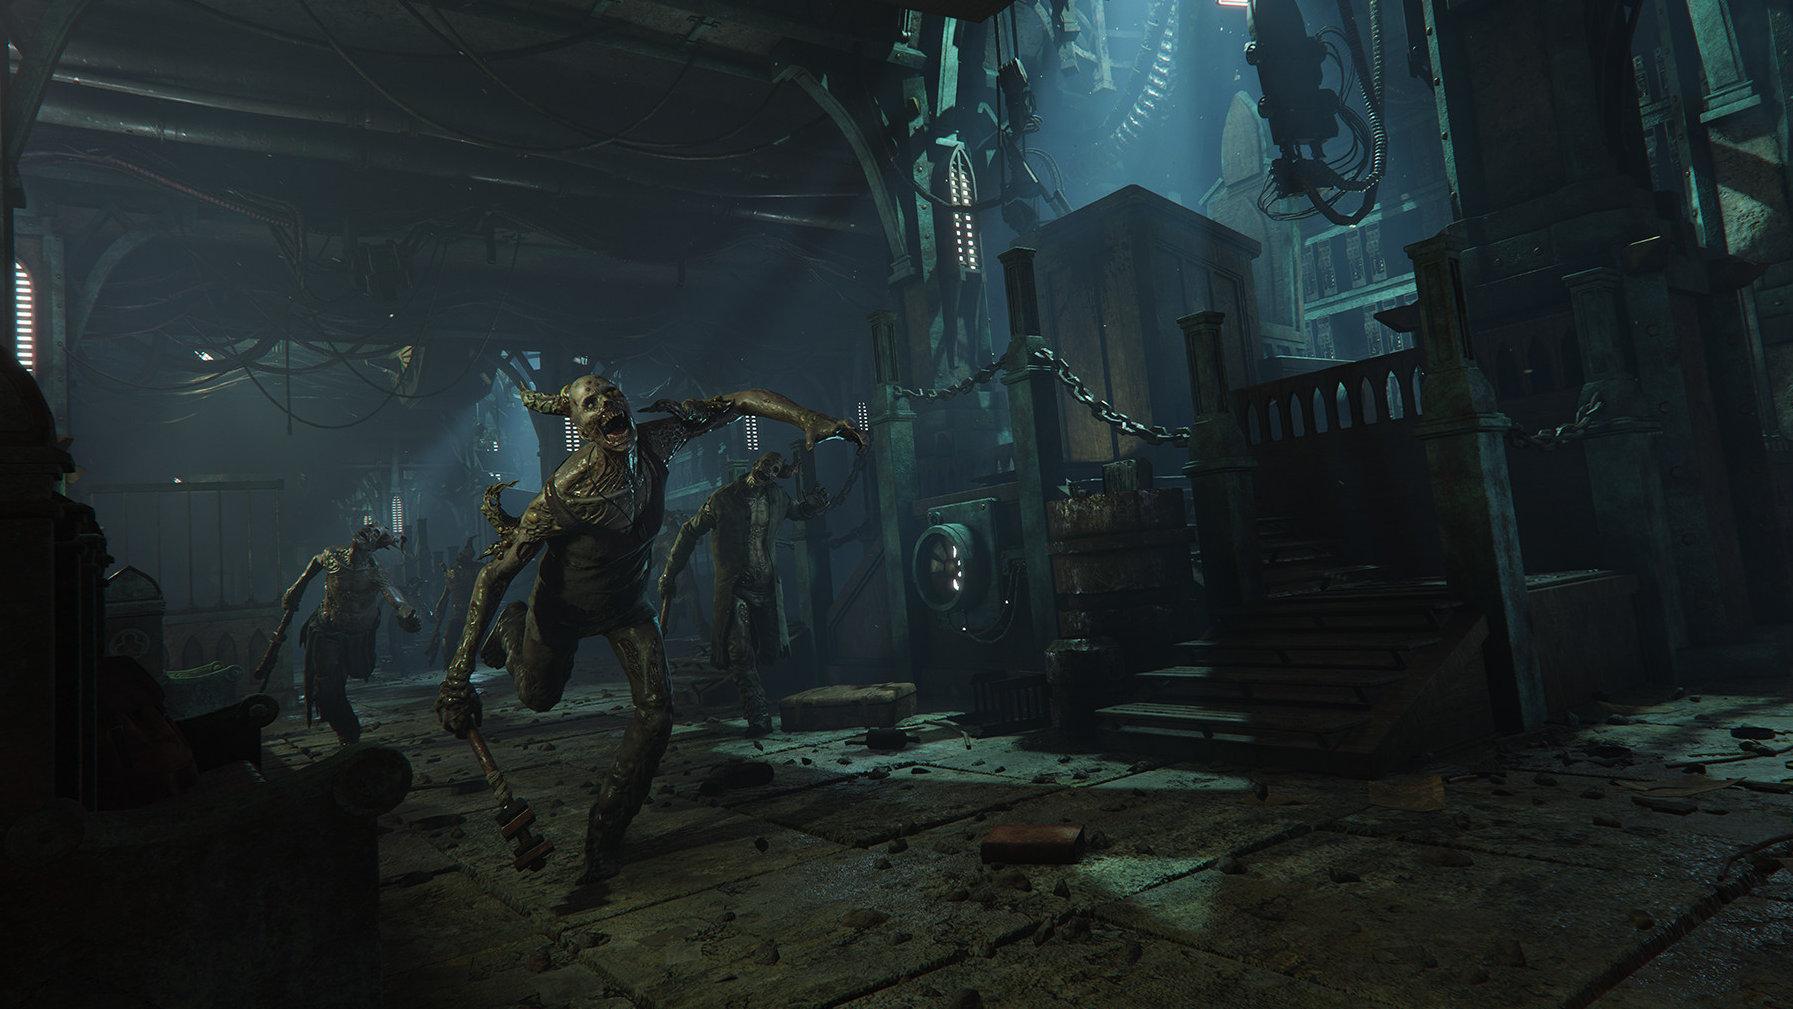 Fatshark announce grimdark co-op romp Warhammer 40,000: Darktide | Rock Paper Shotgun